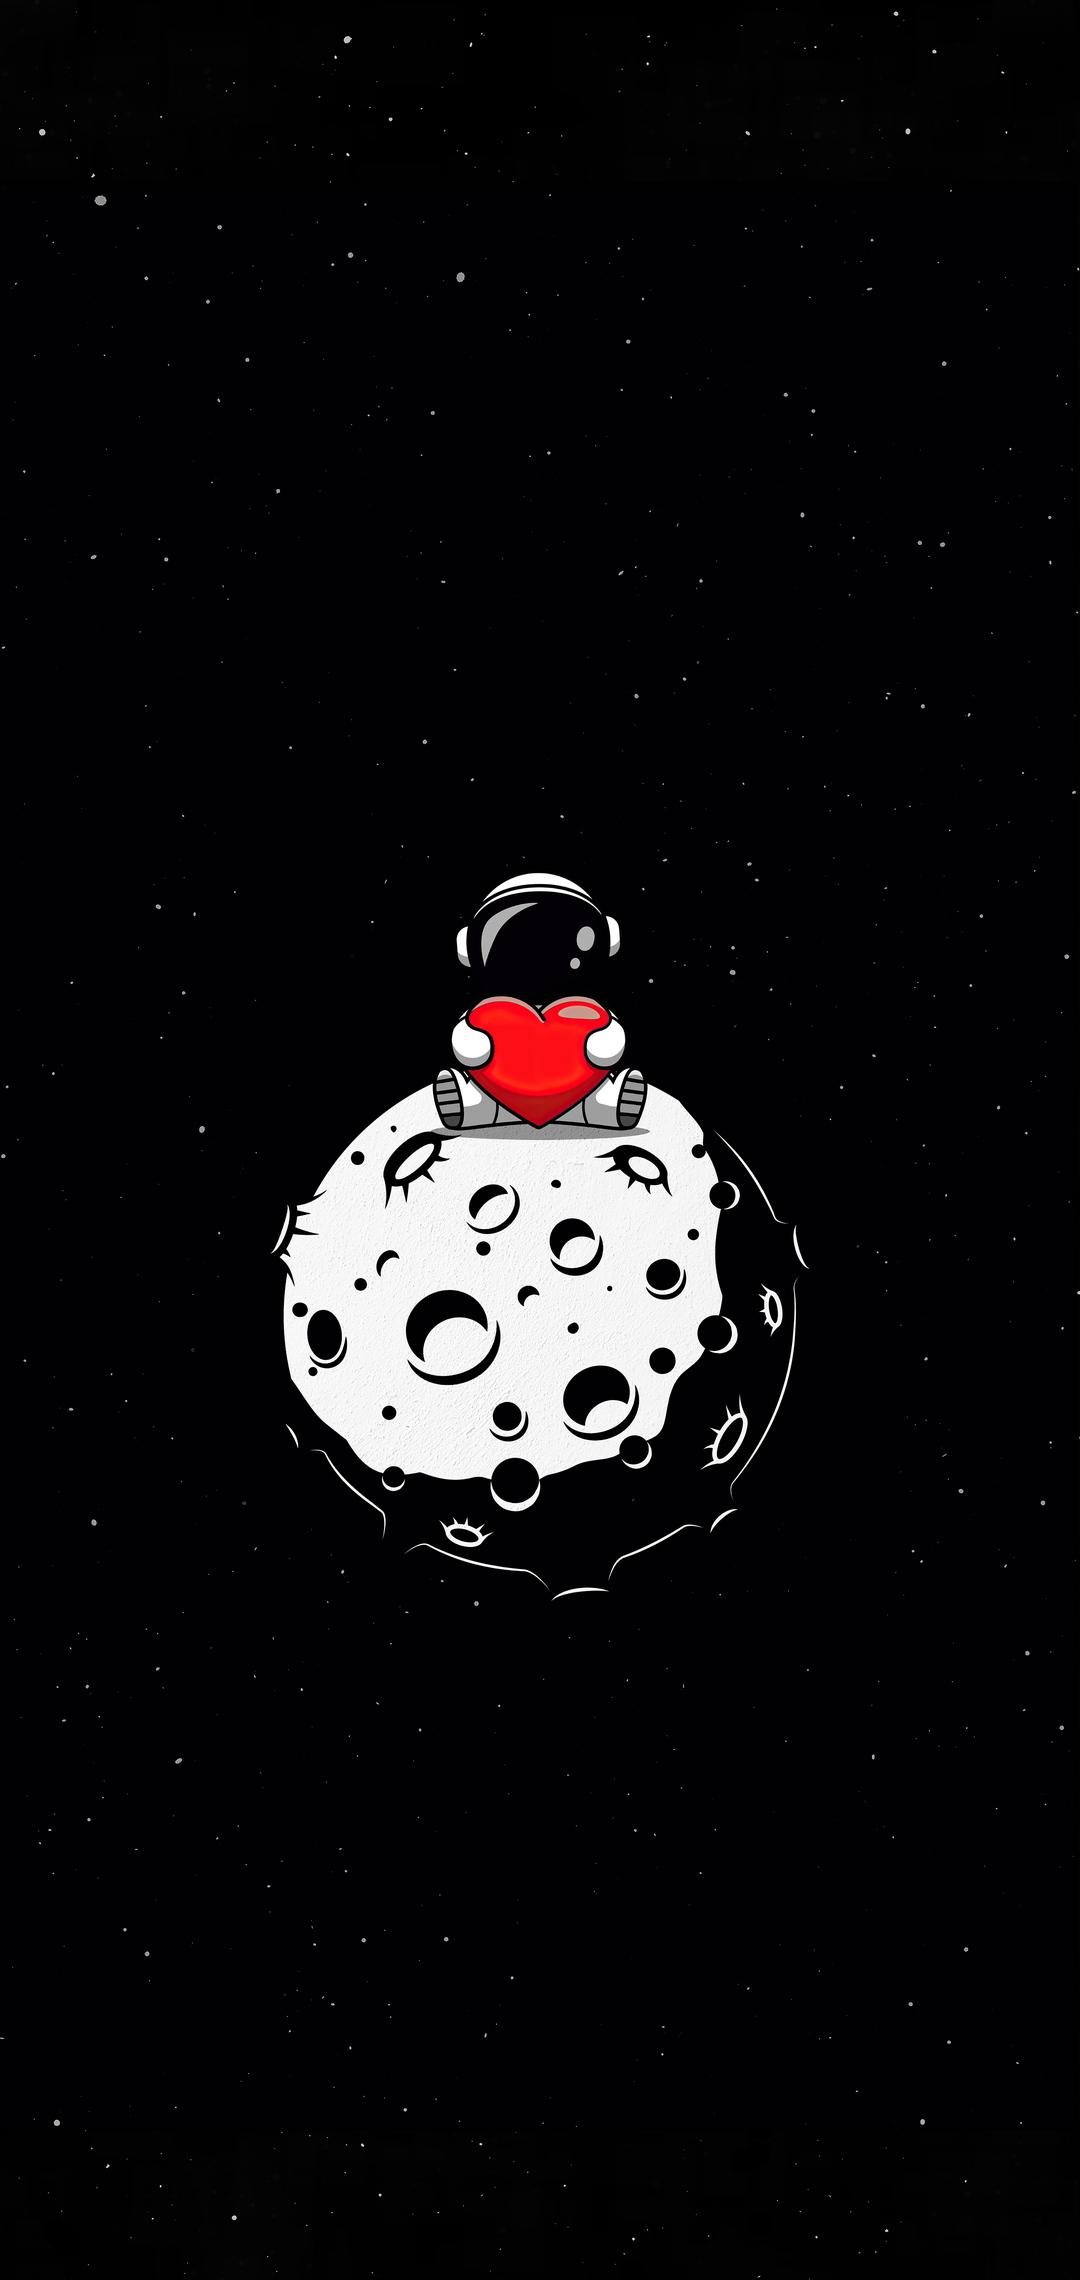 little-astronaut-on-moon-with-heart-in-hand-5k-0o.jpg